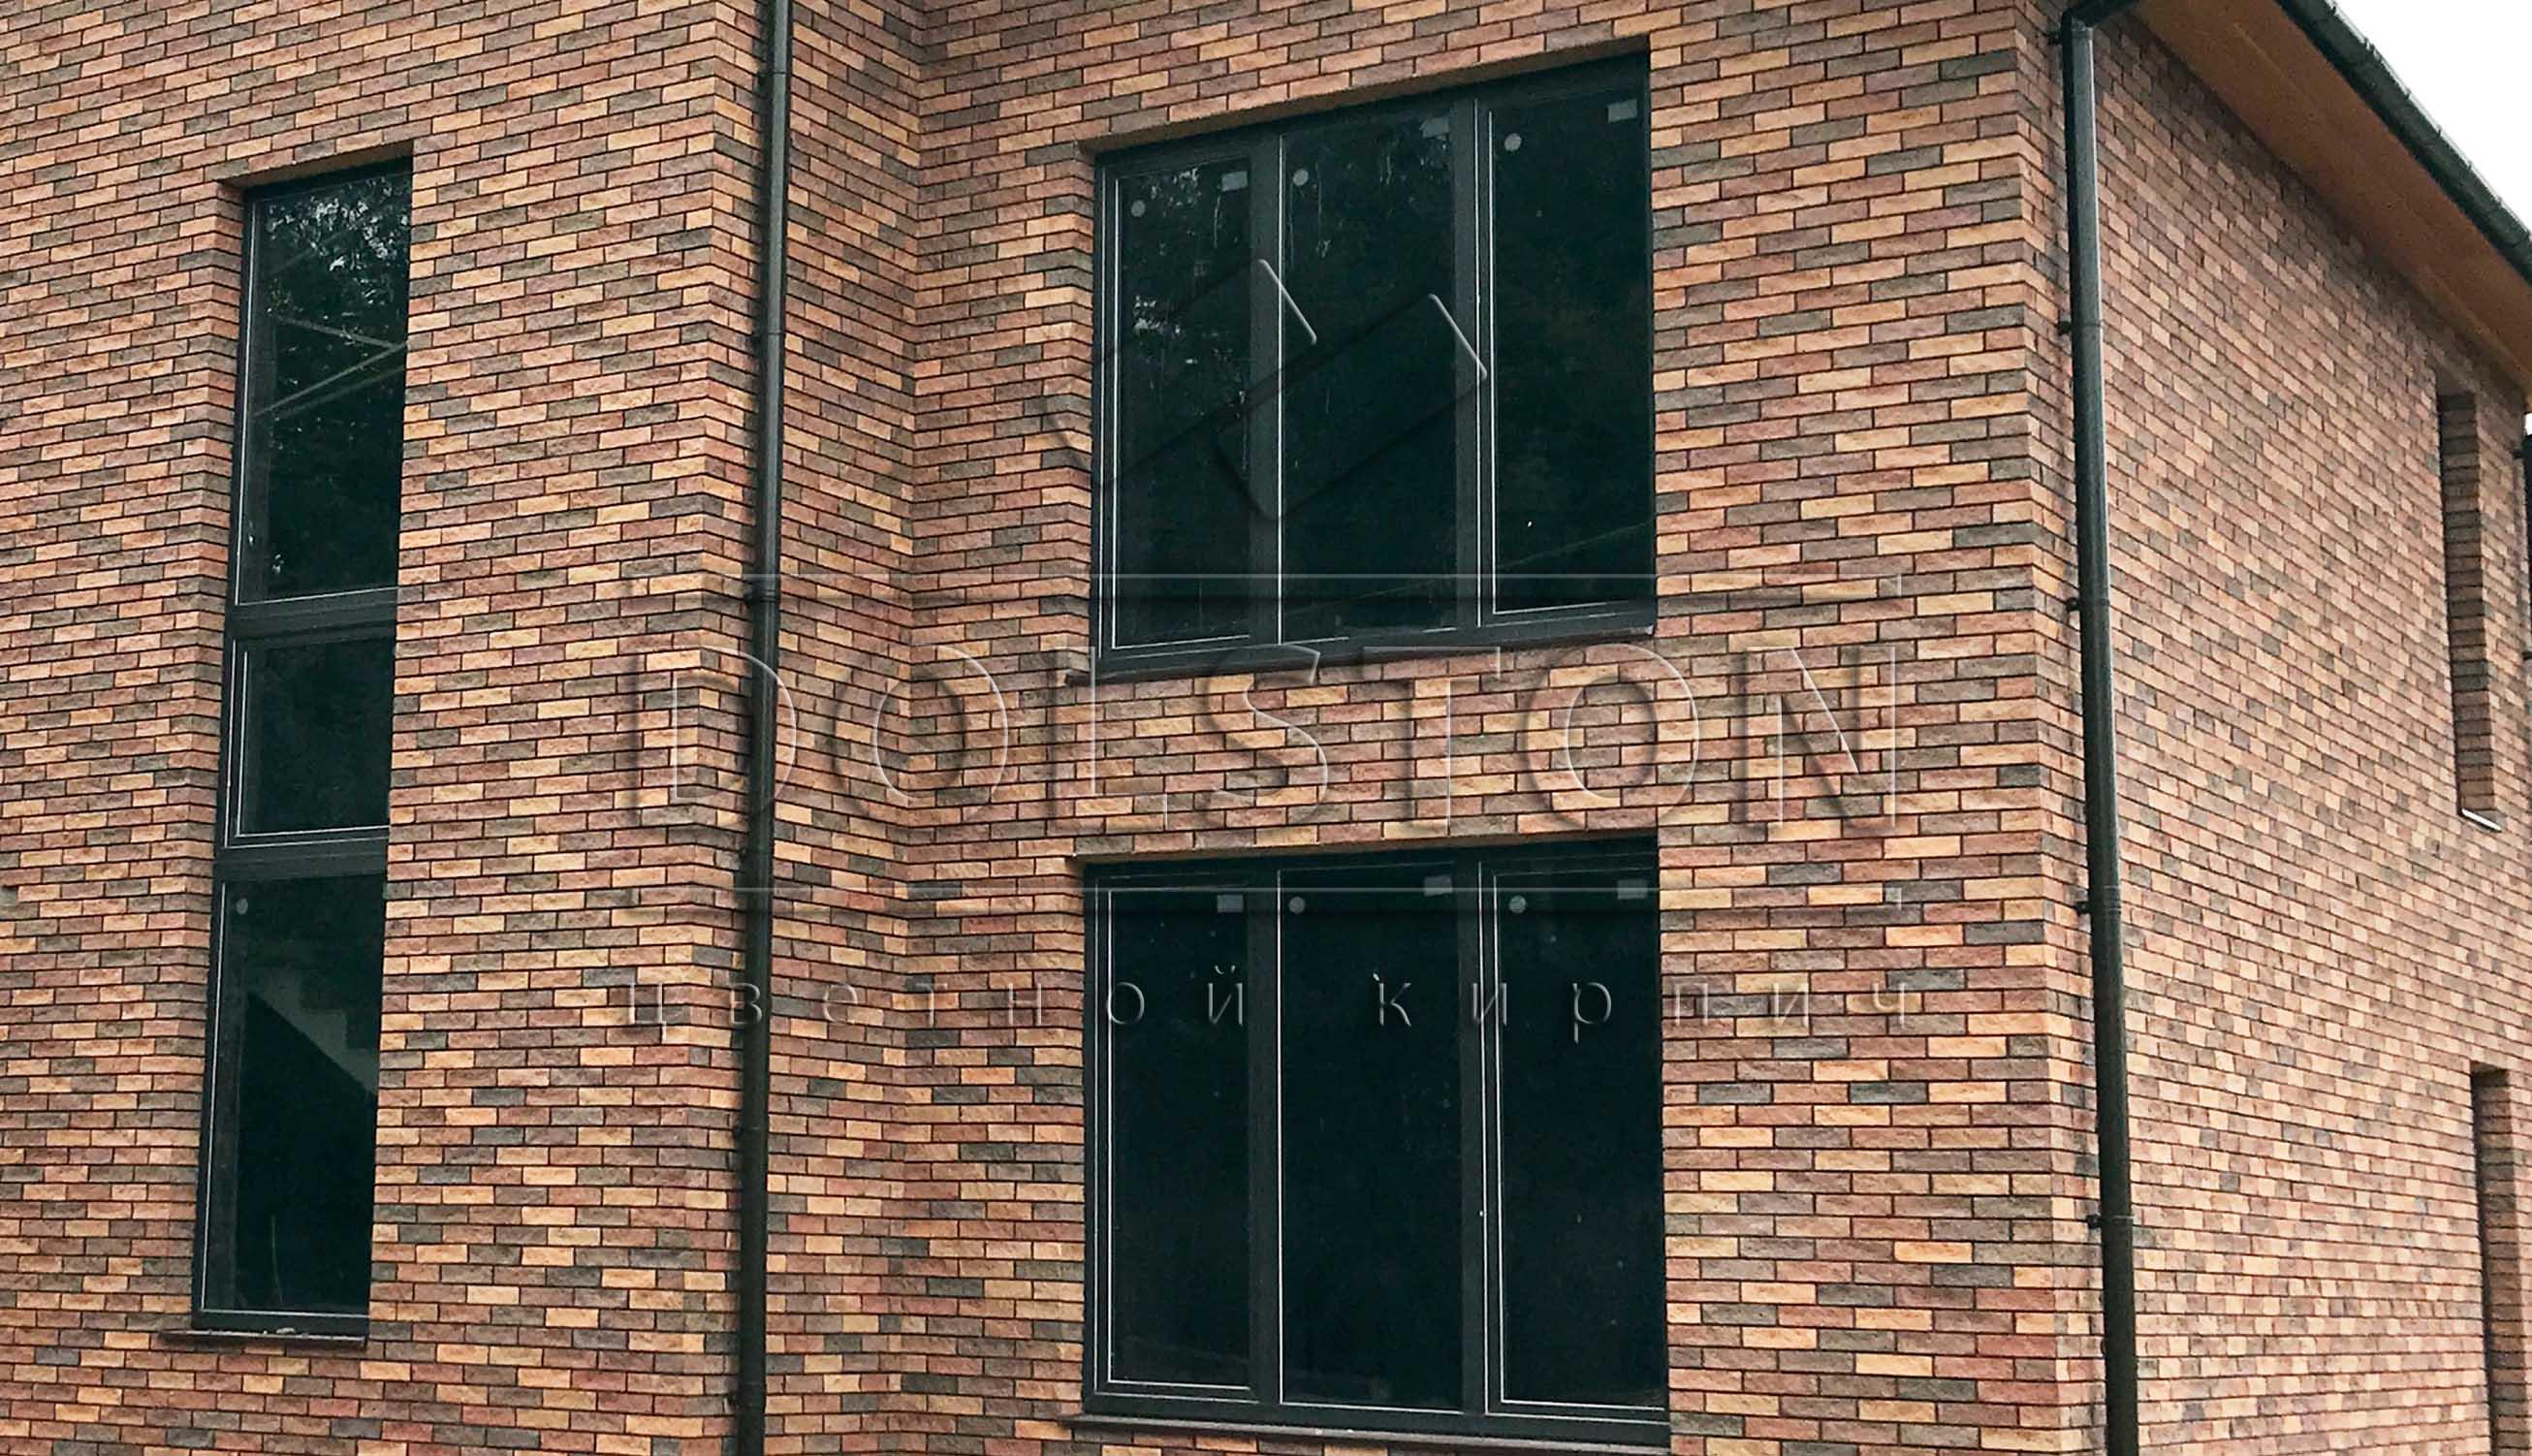 Отделка фасада частного дома фасадной плиткой - фото № 233